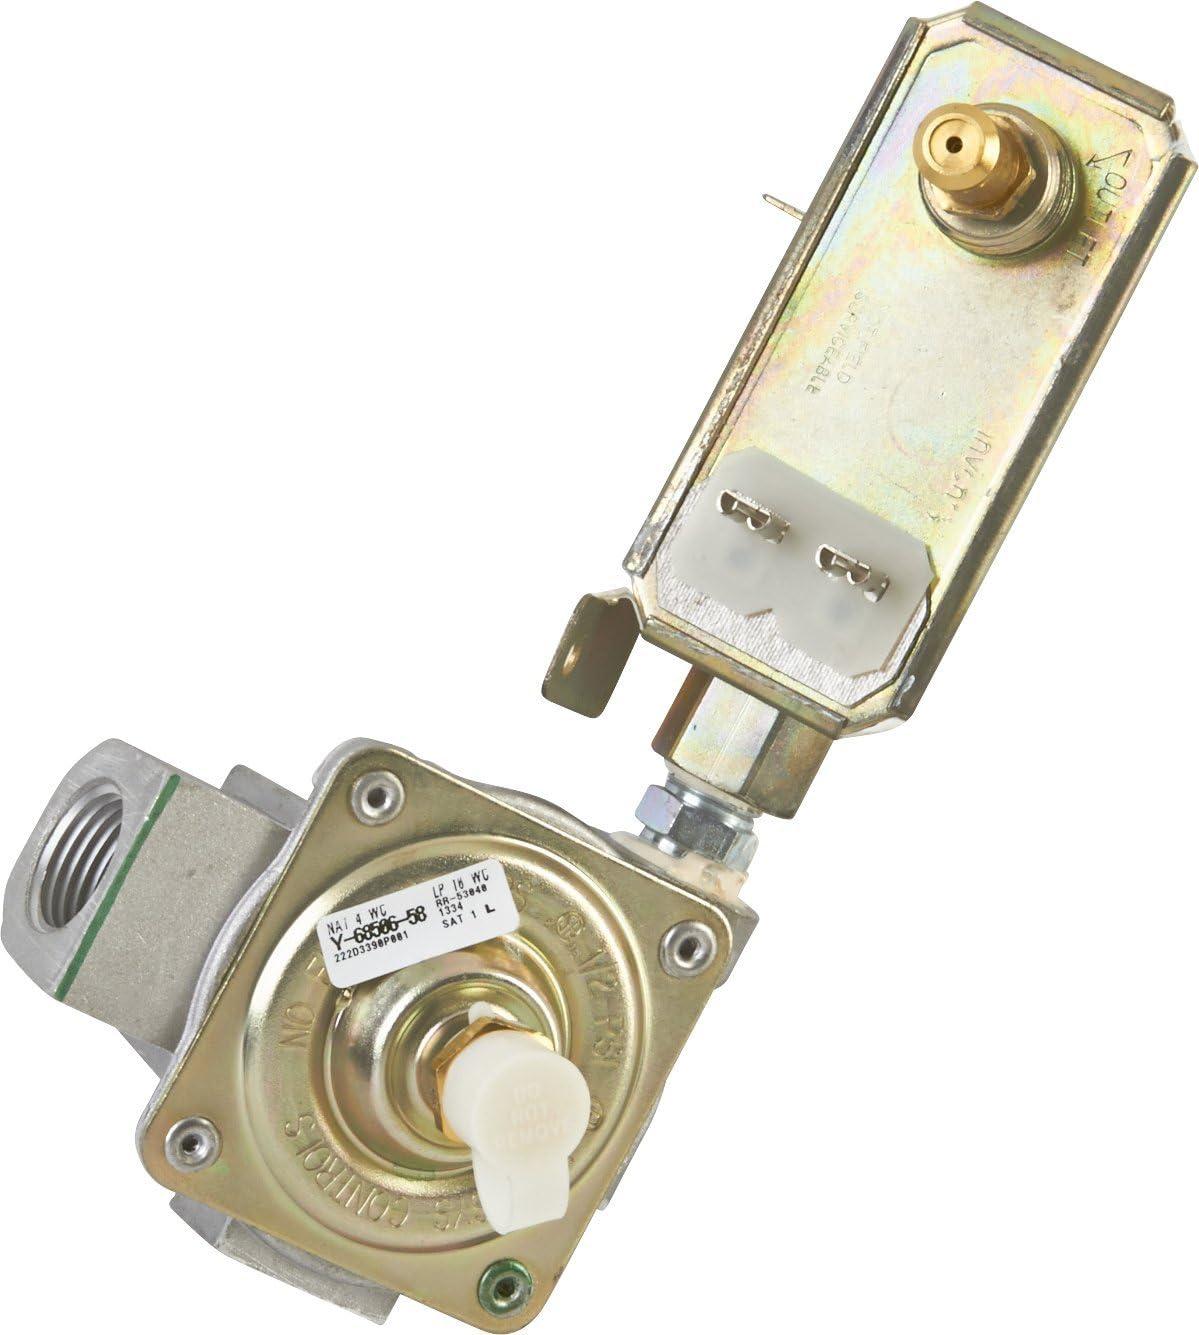 GE WB19K10044Oven Valve and Pressure Regulator